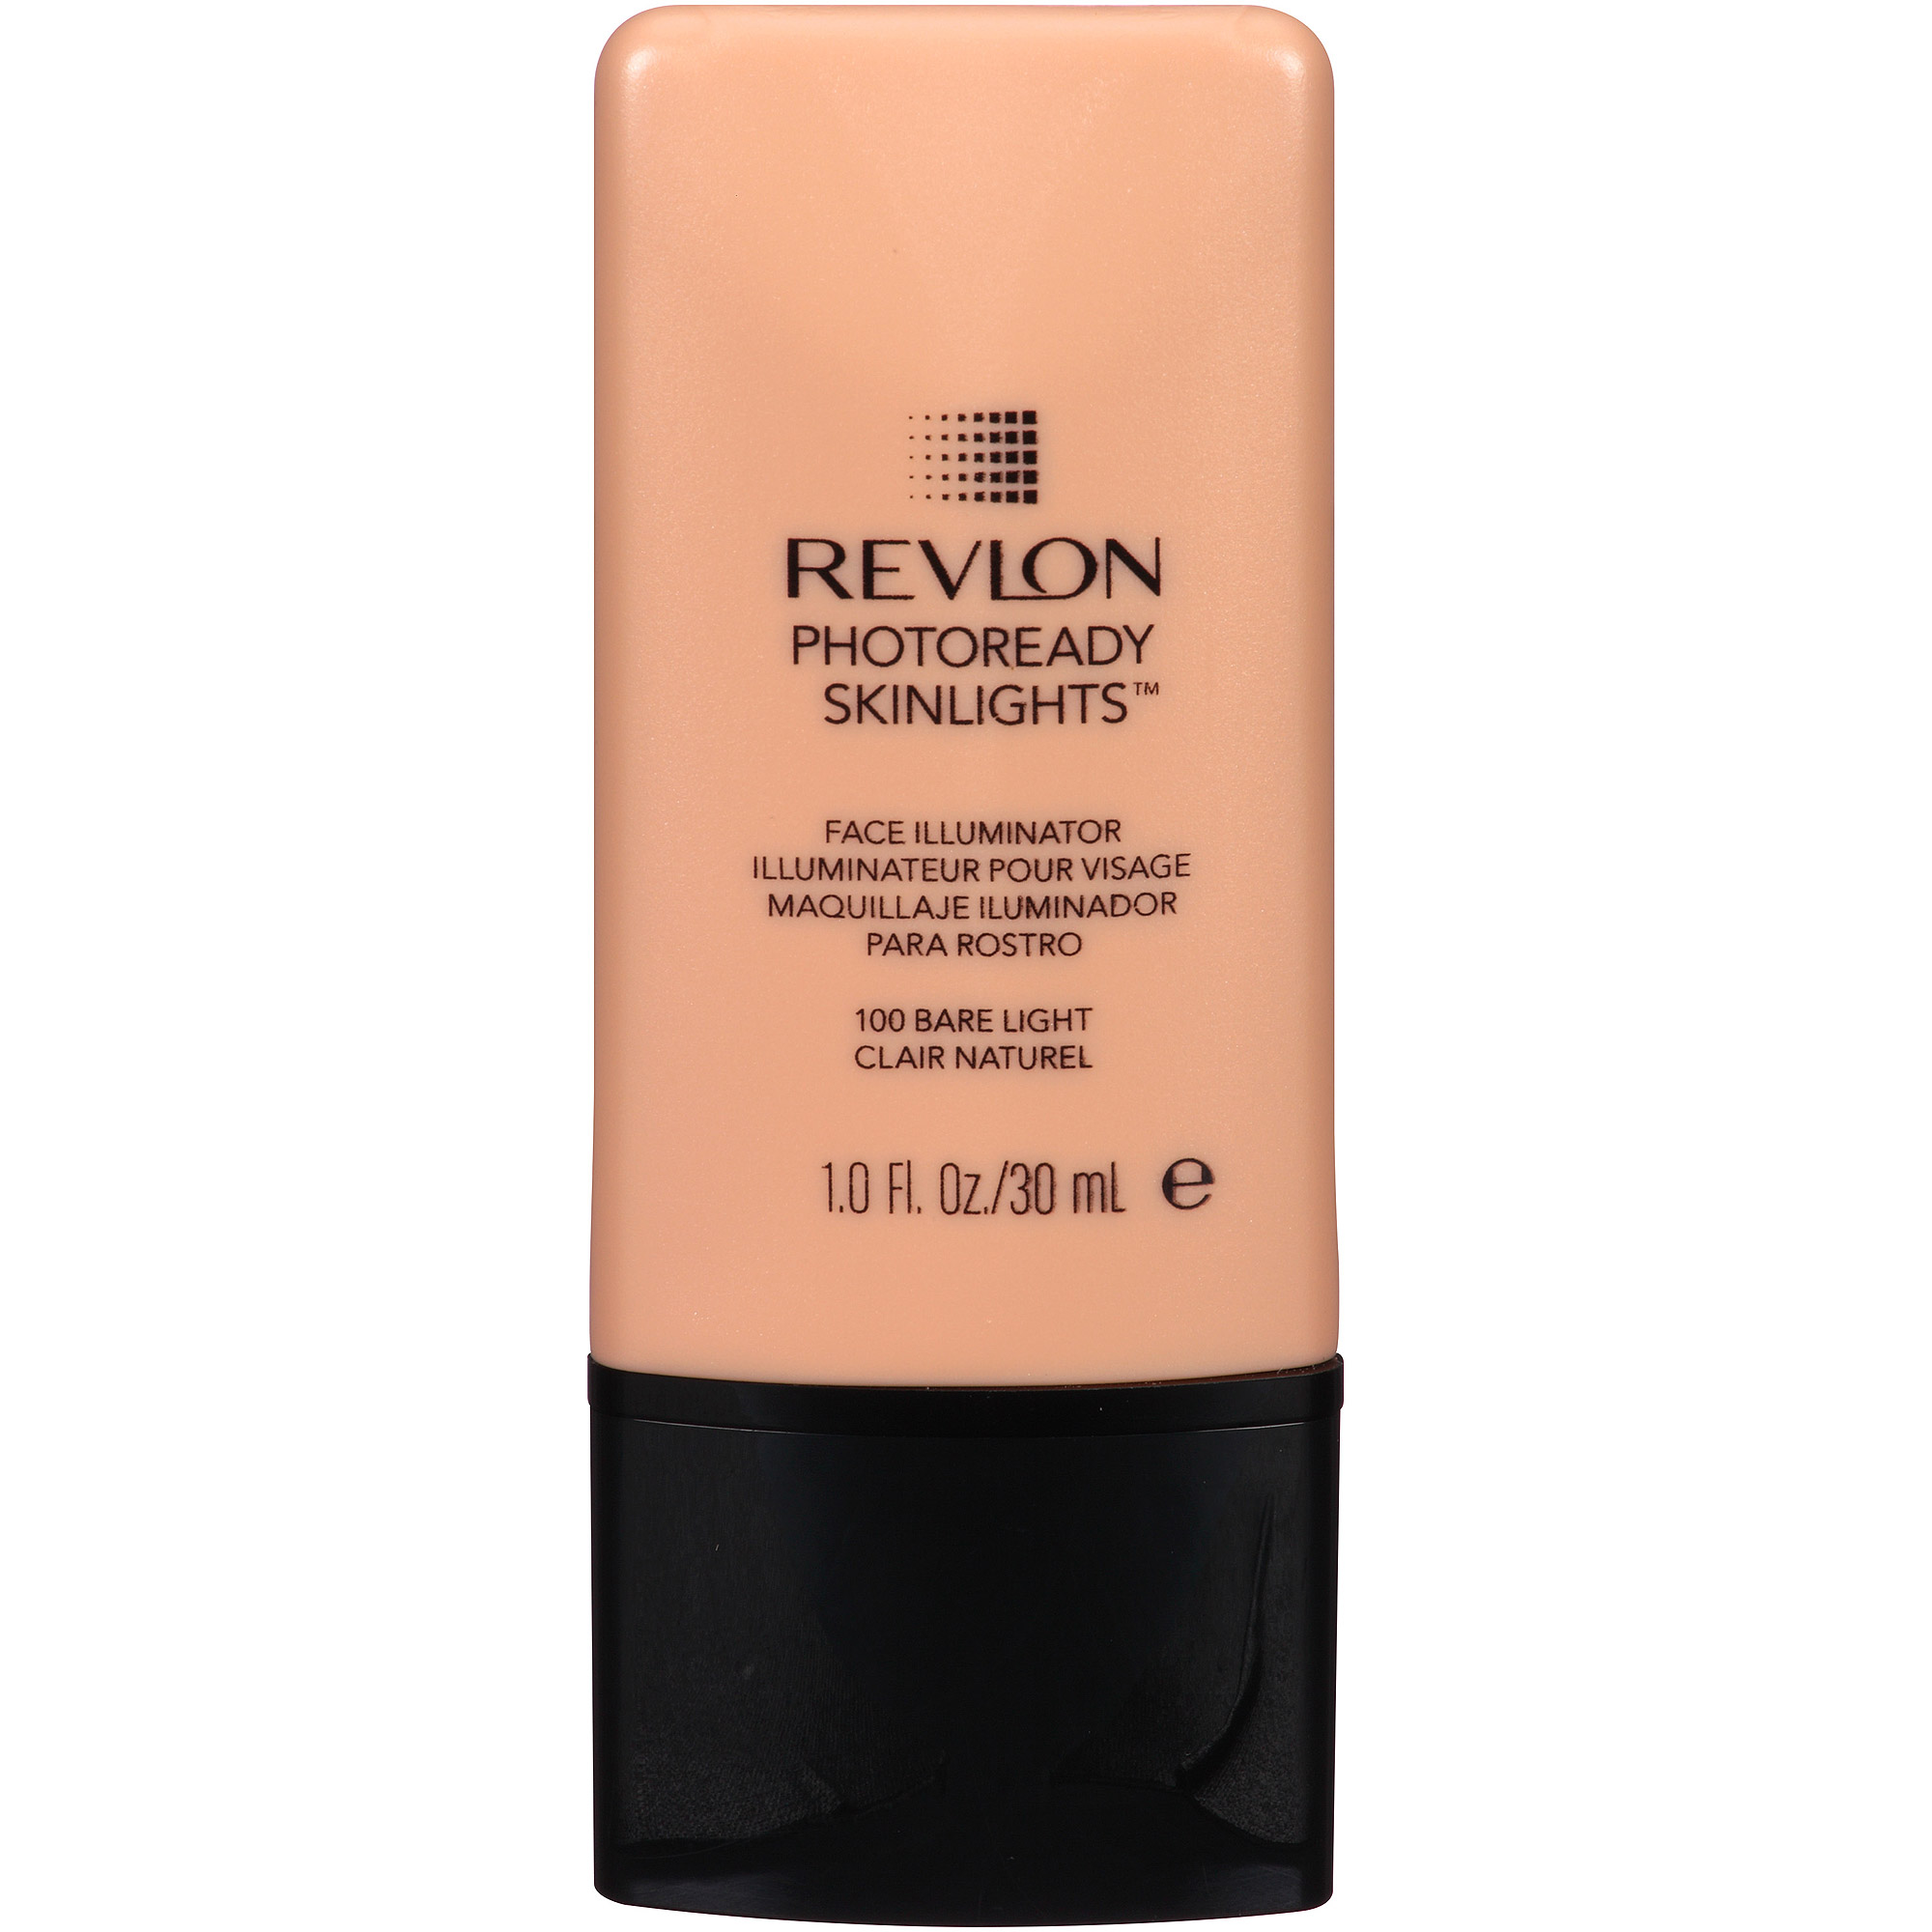 Revlon PhotoReady Skinlights Face Illuminator, 100 Bare Light, 1 fl oz